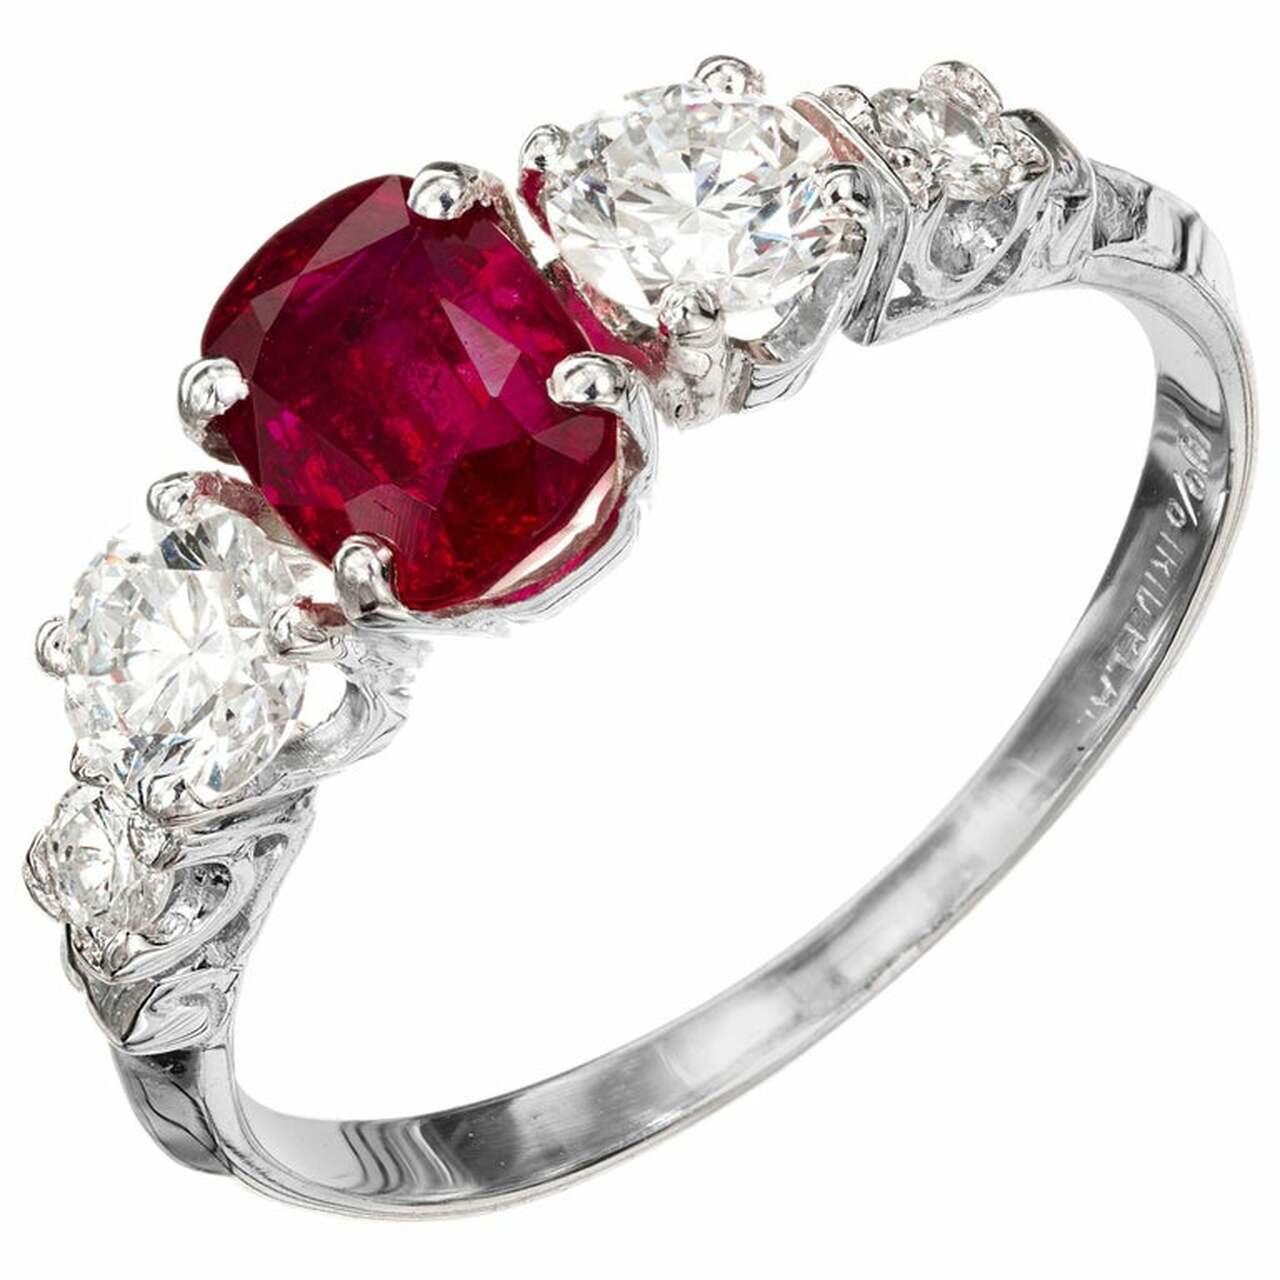 Shop Ruby Birthstone Jewelry for Someone Celebrating a July Birthday